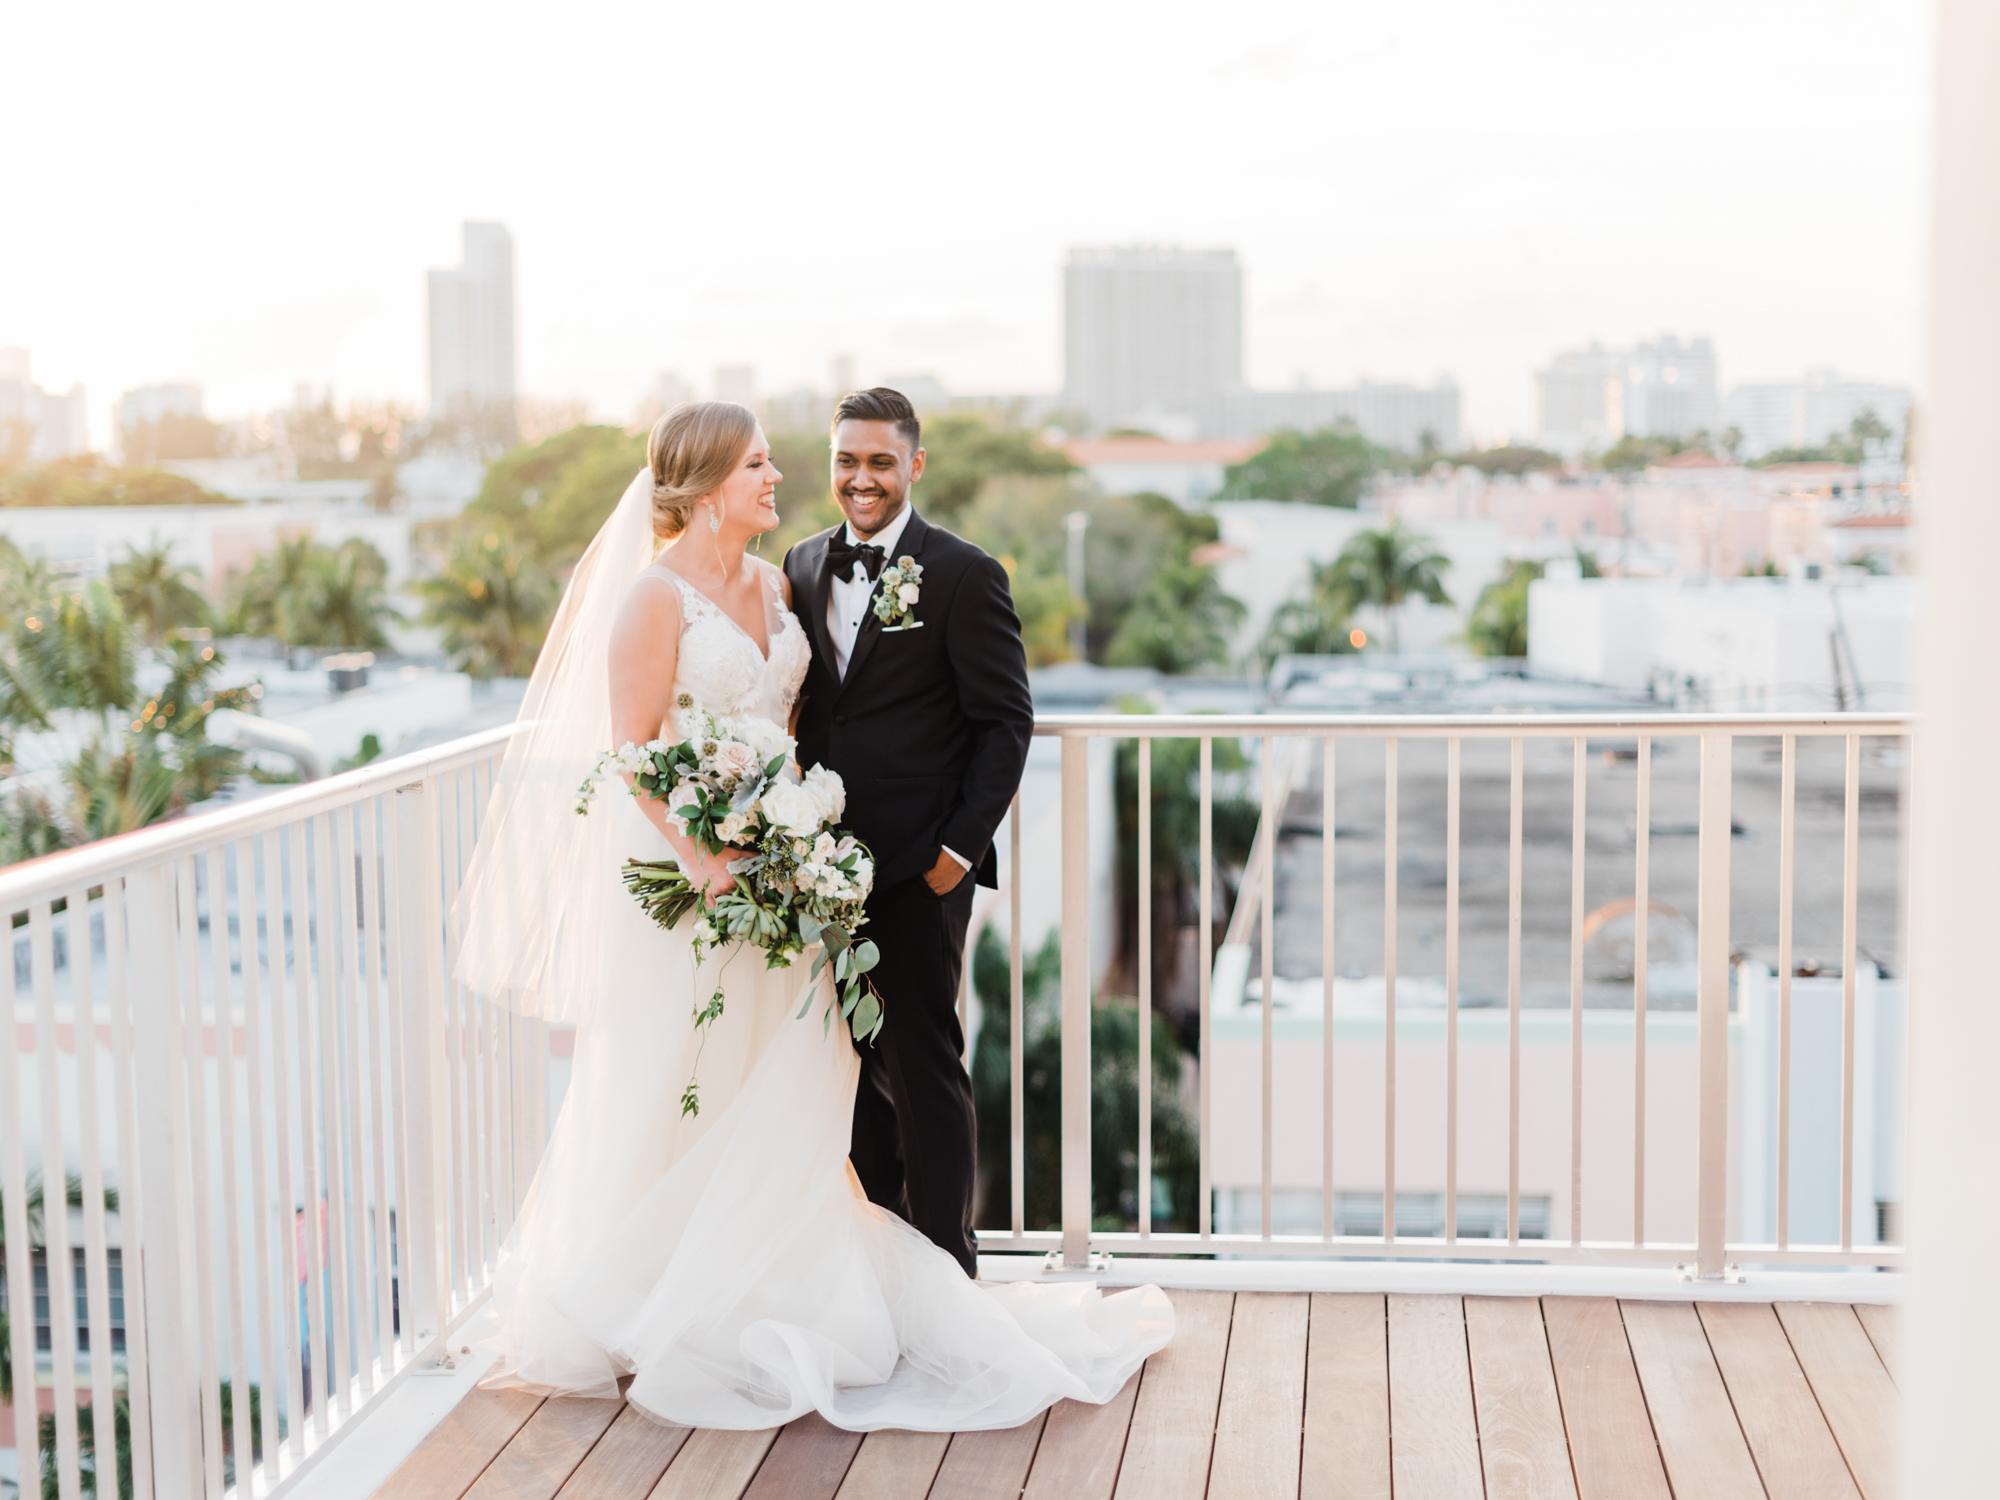 betsy-hotel-wedding-south-beach-miami-charleston-south-carolina-destination-wedding-photographer-26.jpg